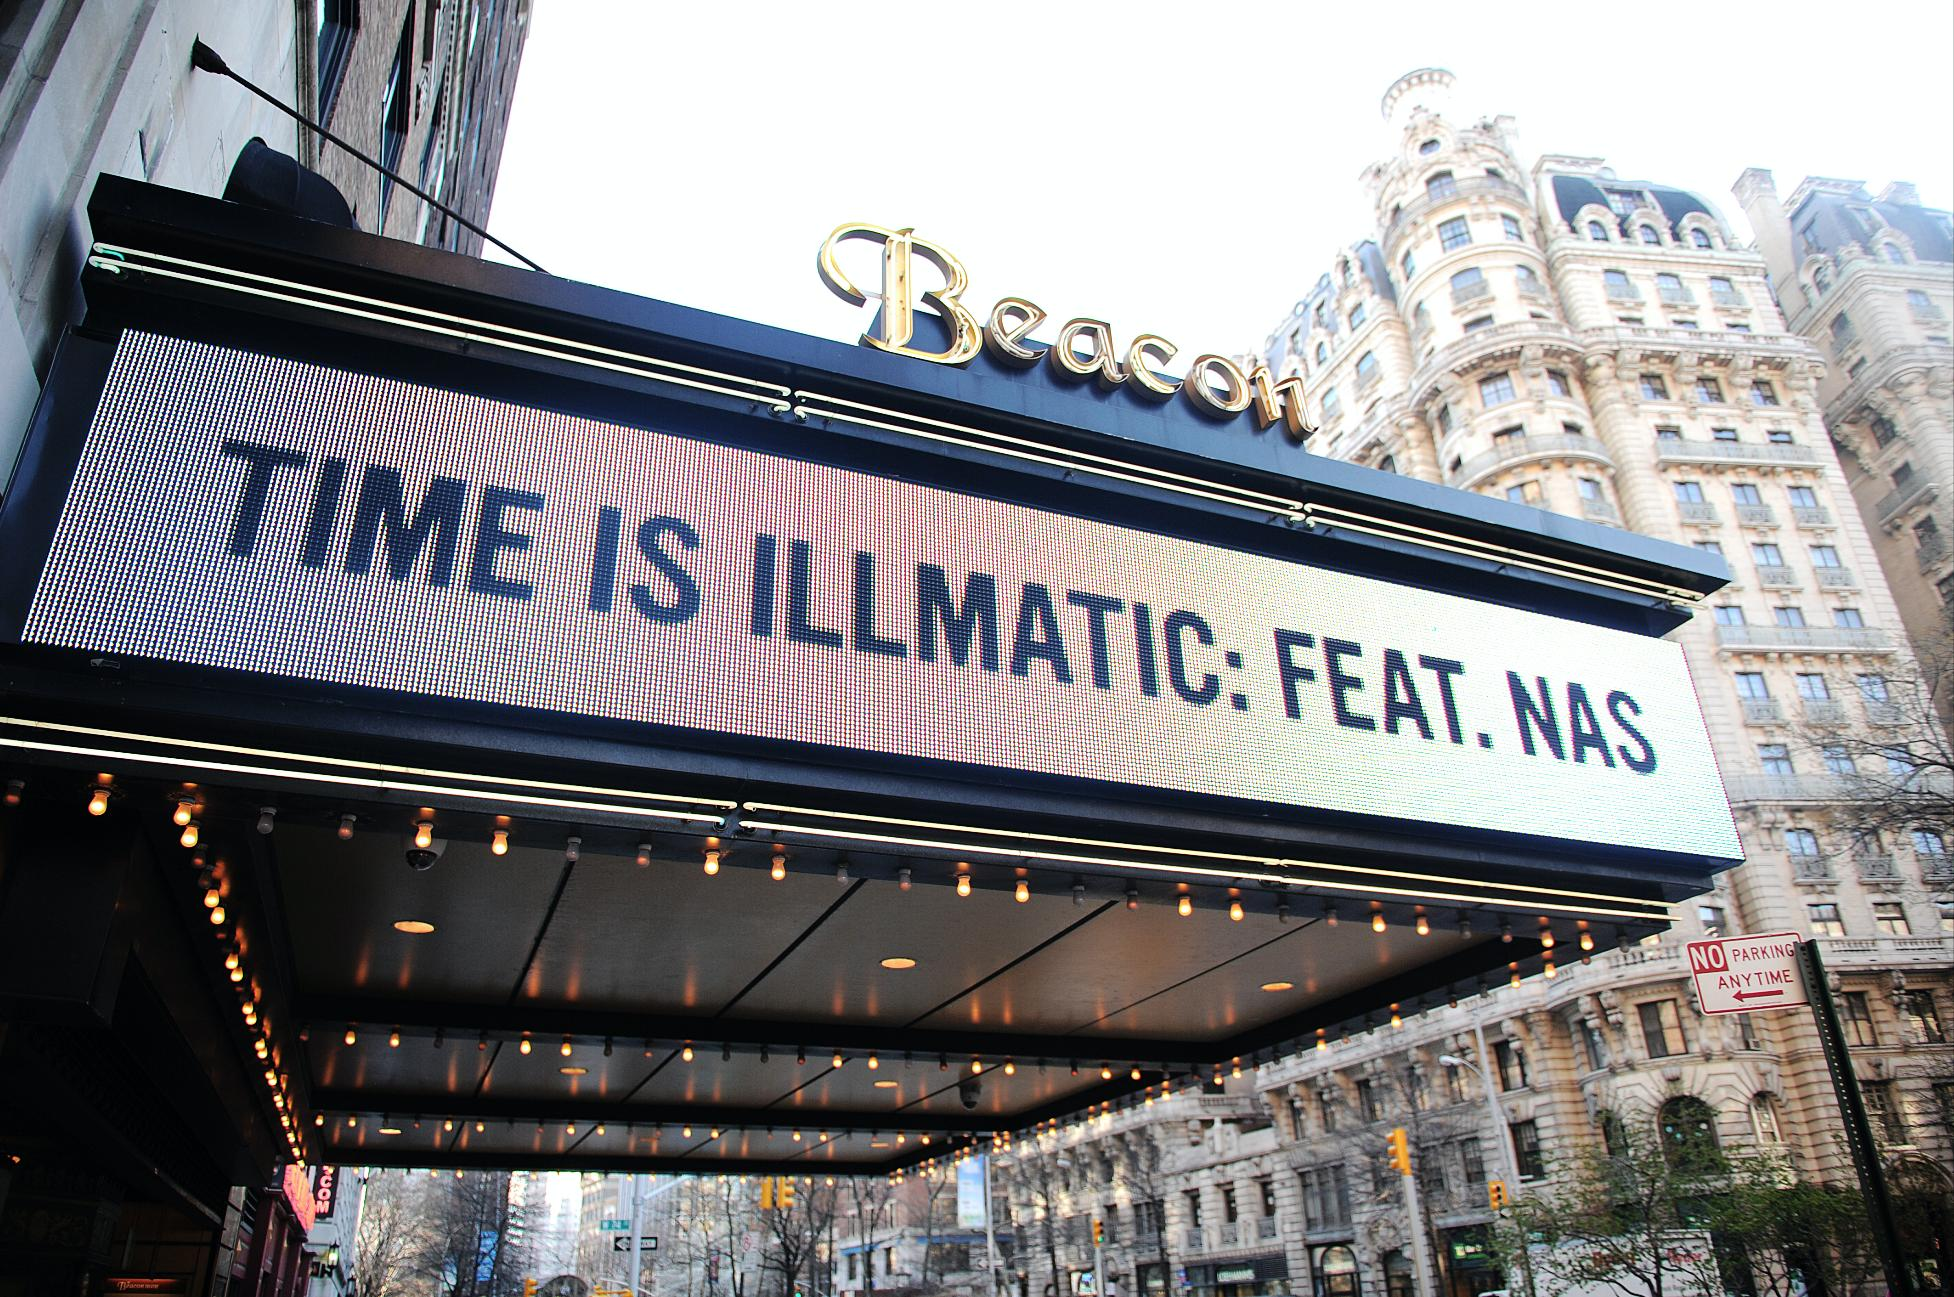 Tribeca Film Festival Opening Night 2014 New York City